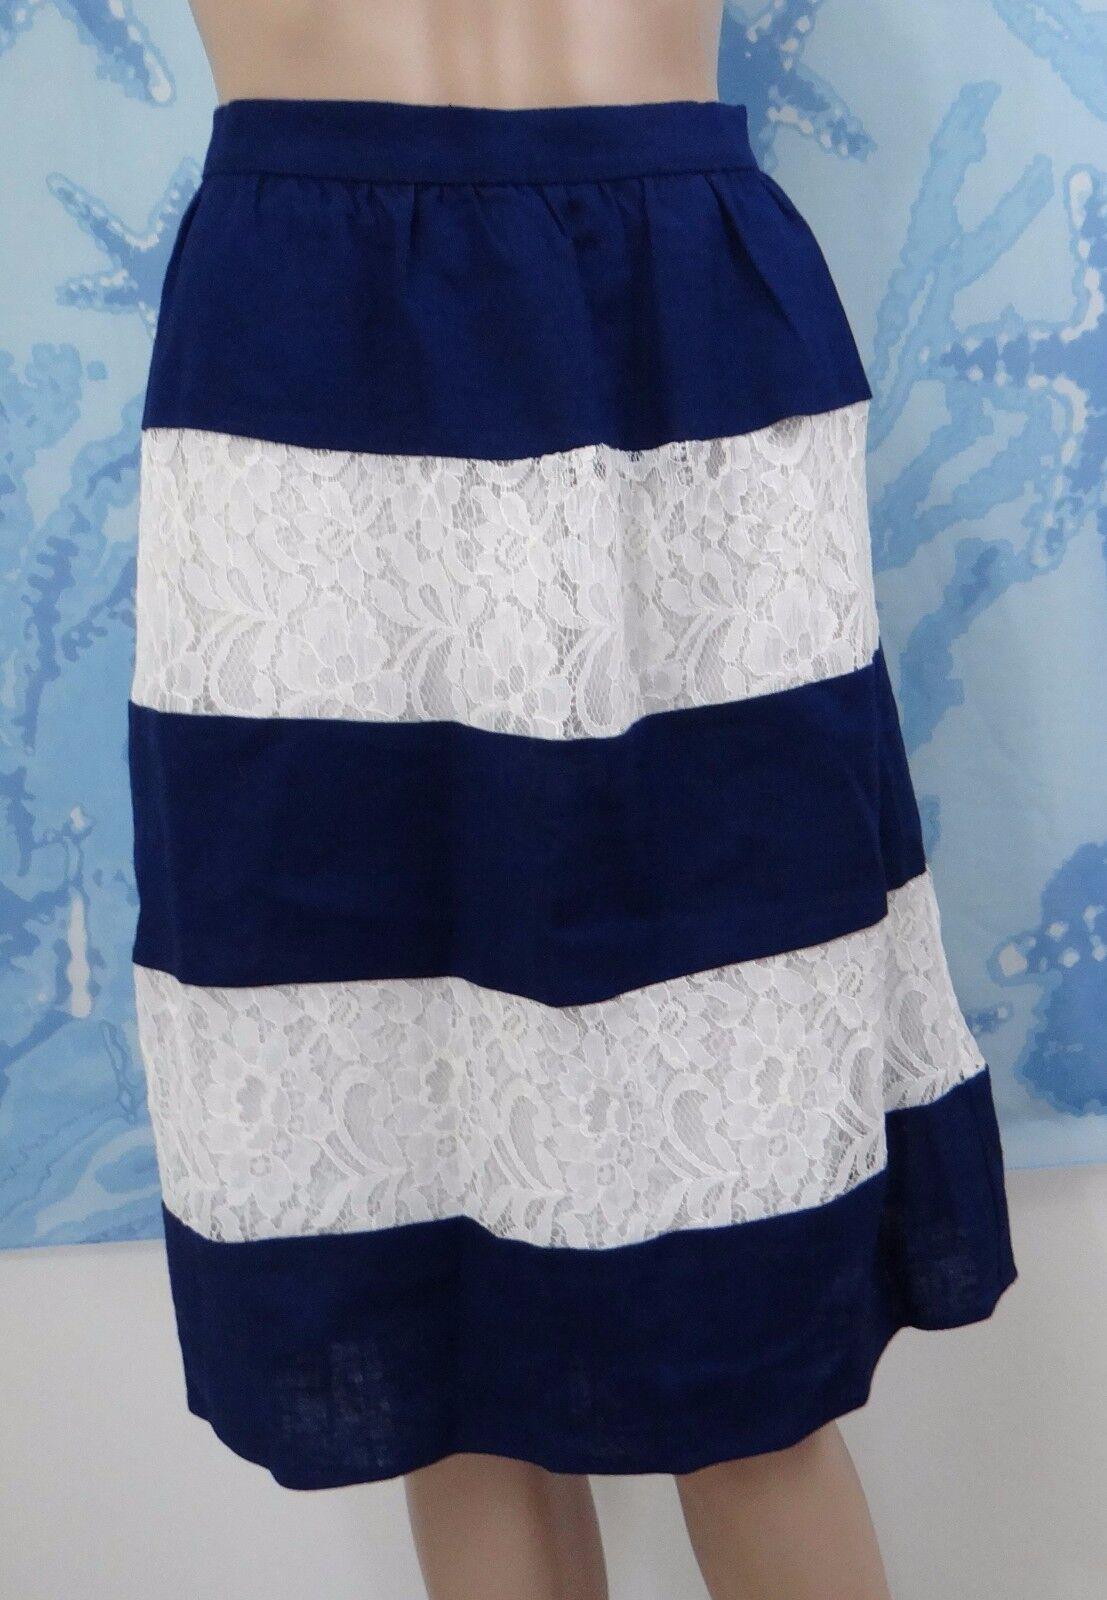 Lark & Ro Women's white Lace and navy Linen Striped Skirt, size L